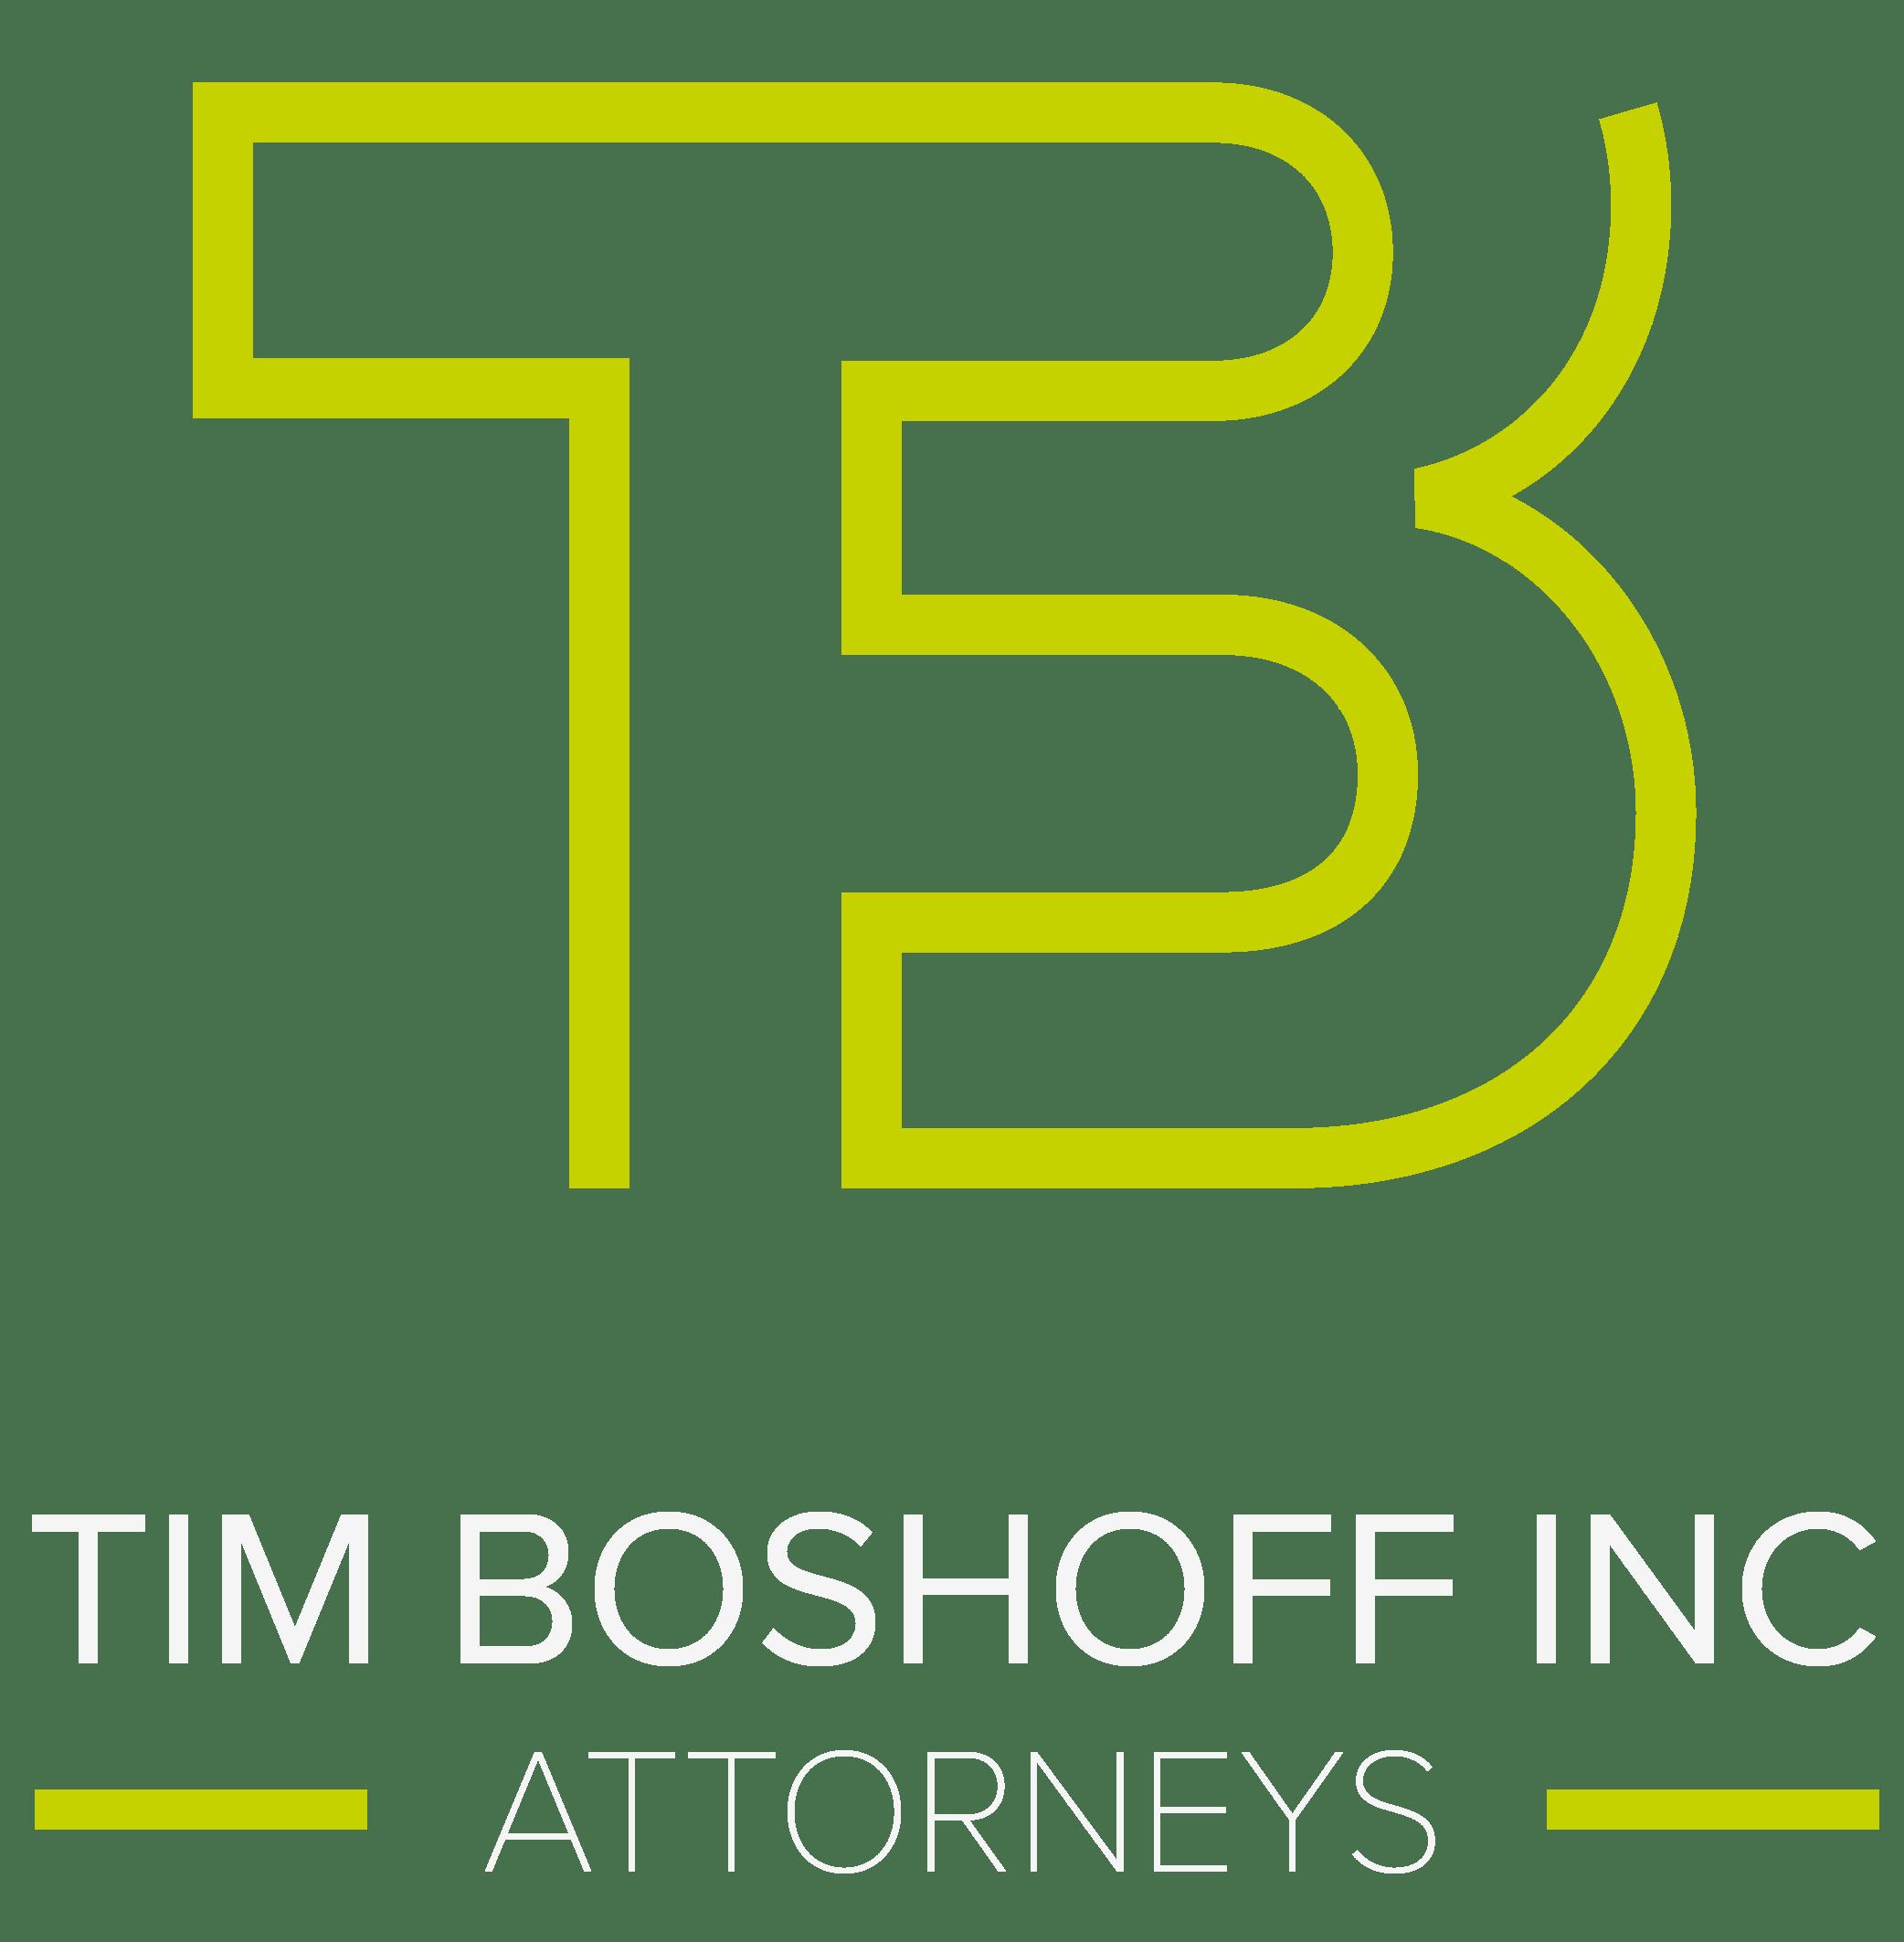 Tim Boshoff Attorneys